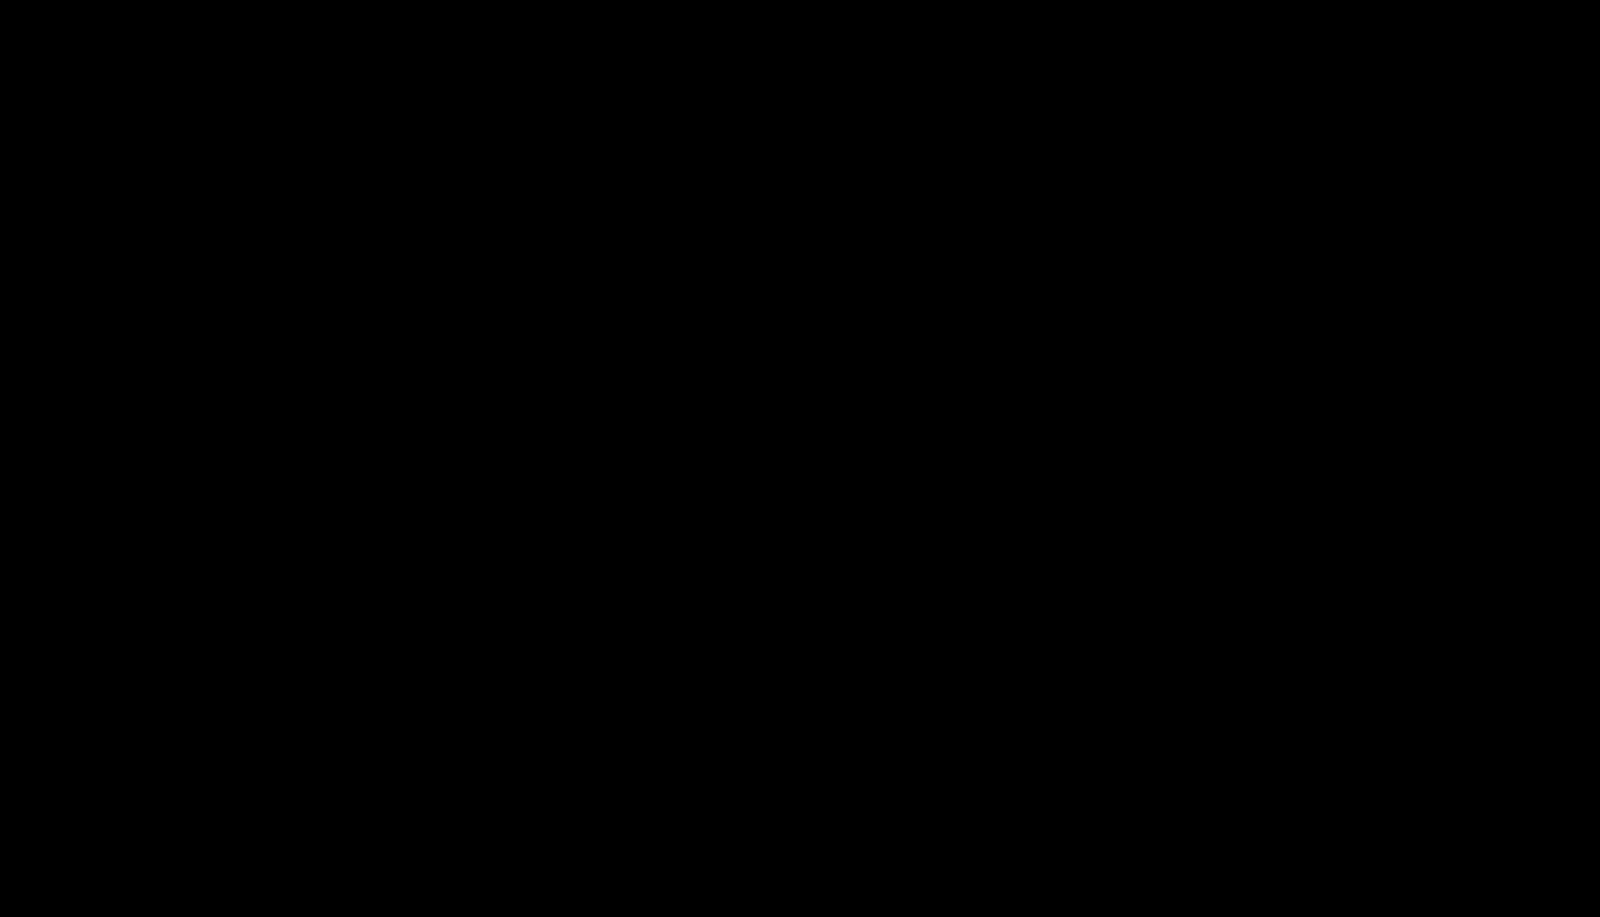 Crown clip art silhouette. Tiara transprent png free